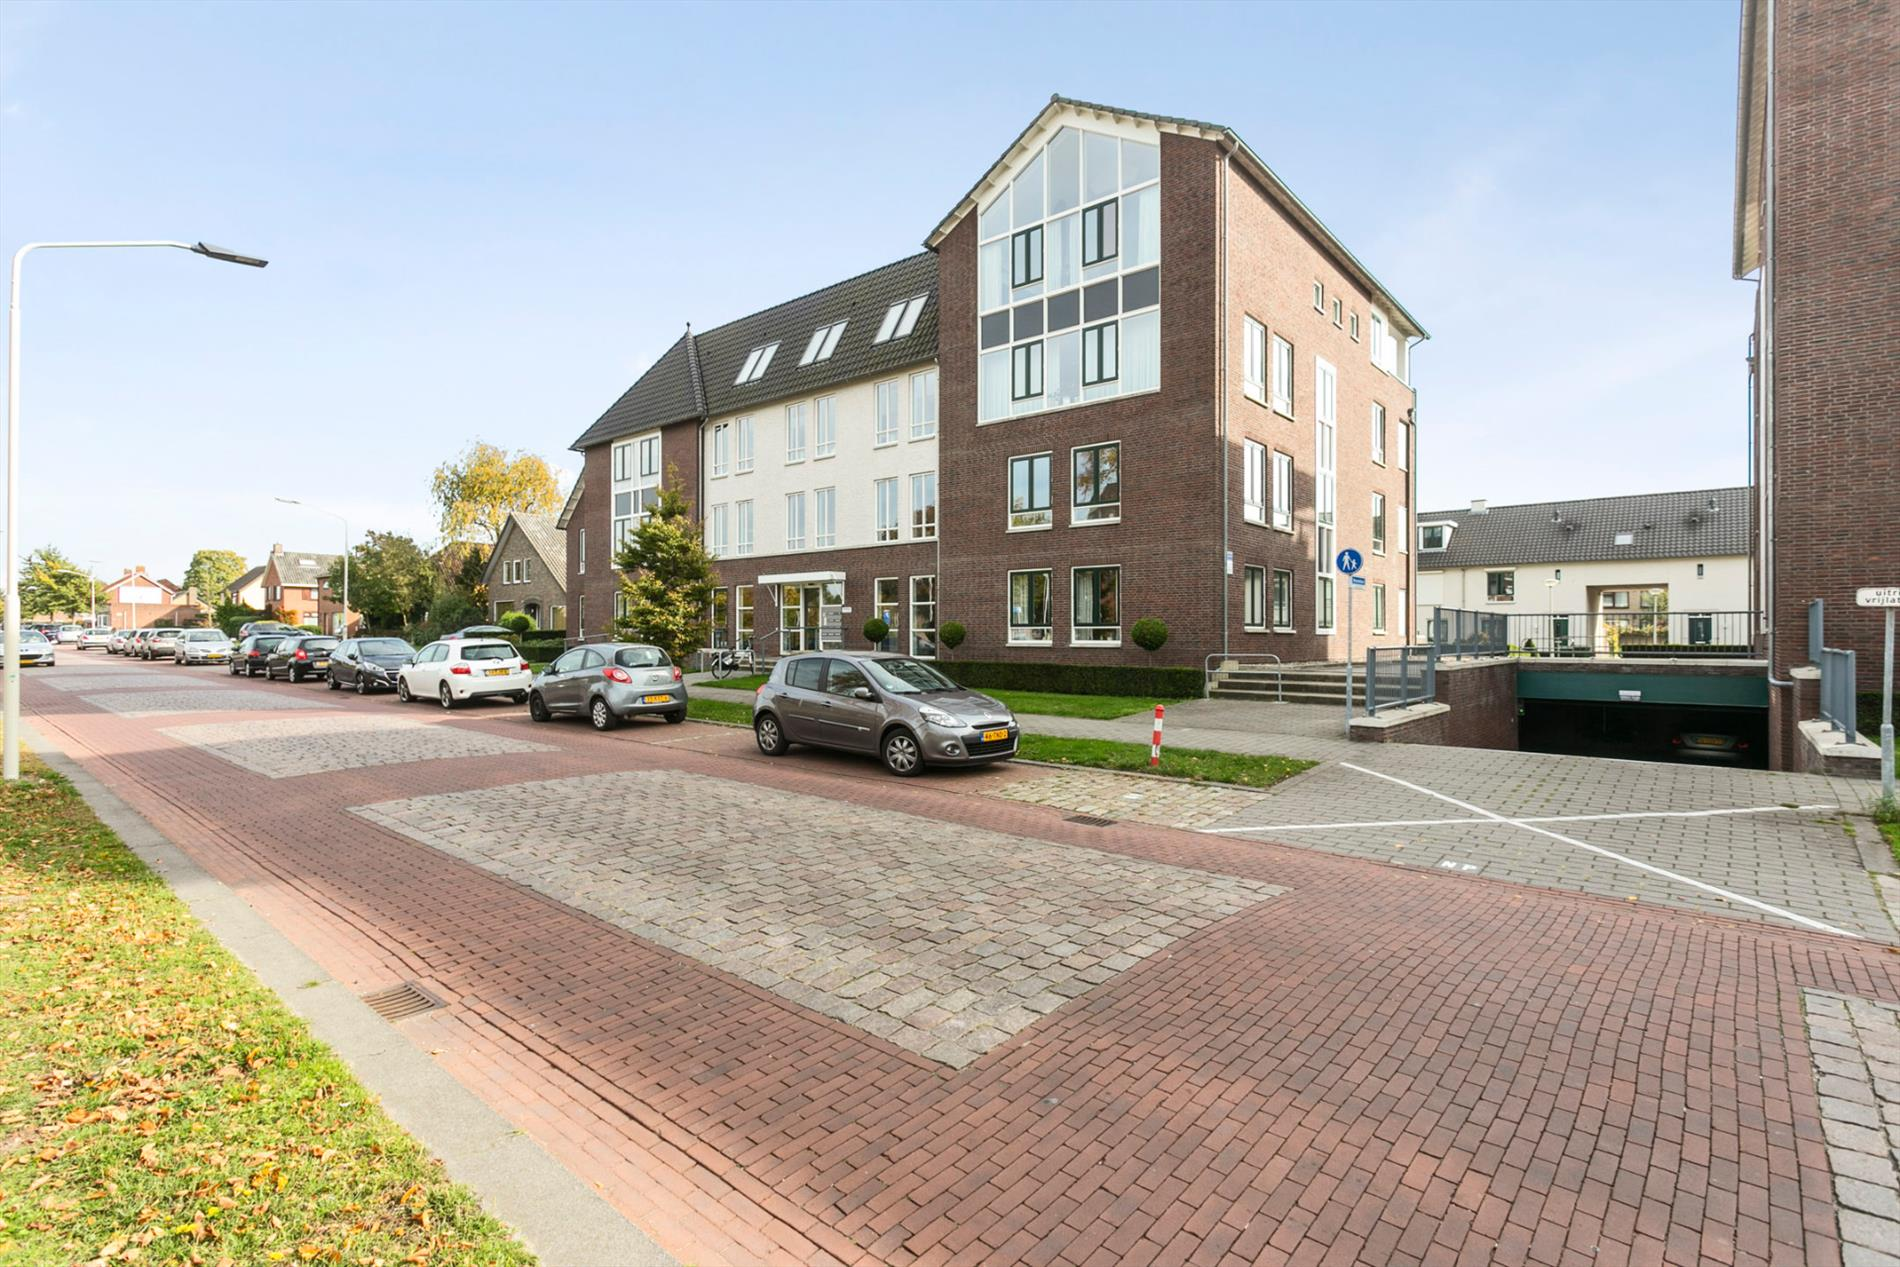 Meulenblock 20, 4631 ZZ Hoogerheide - 05862214_25.jpg